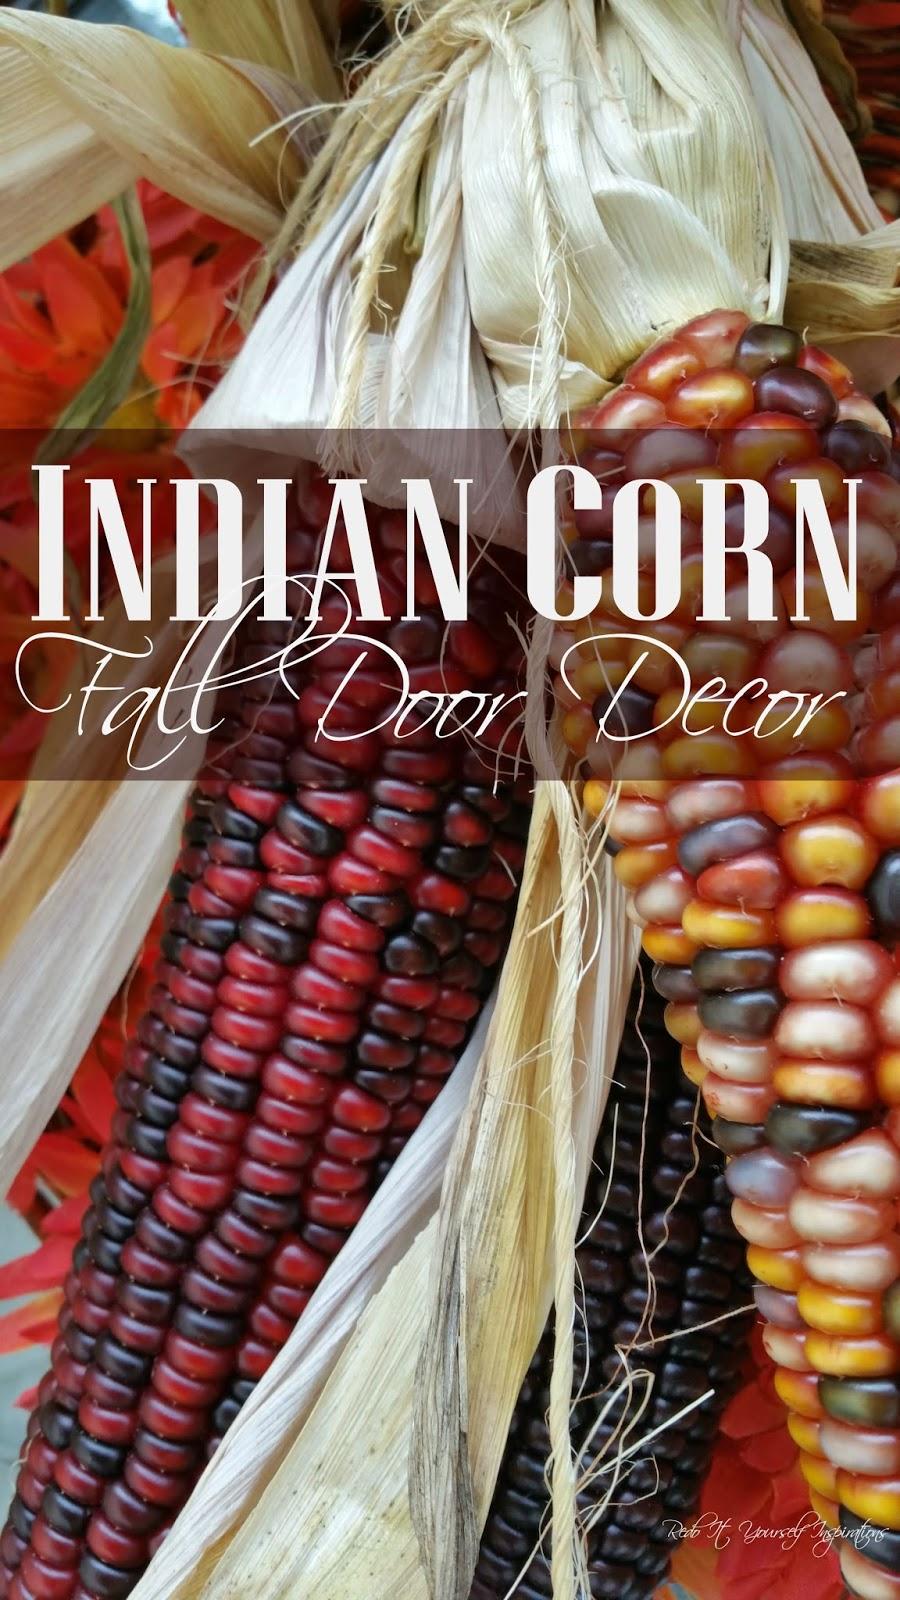 Indian corn door decor redo it yourself inspirations fall indian